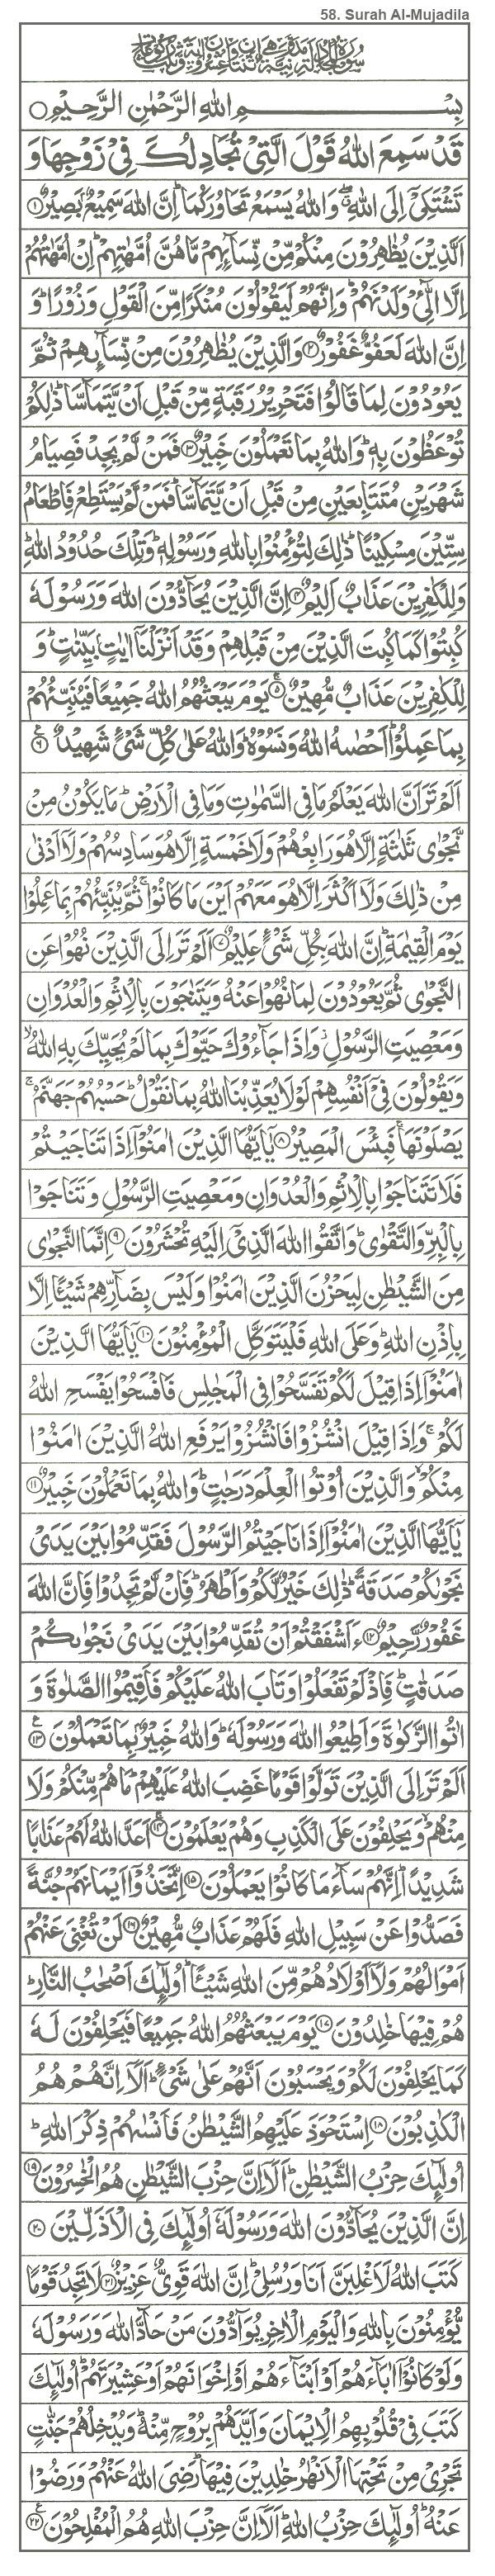 58. Surah Al-Mujadila